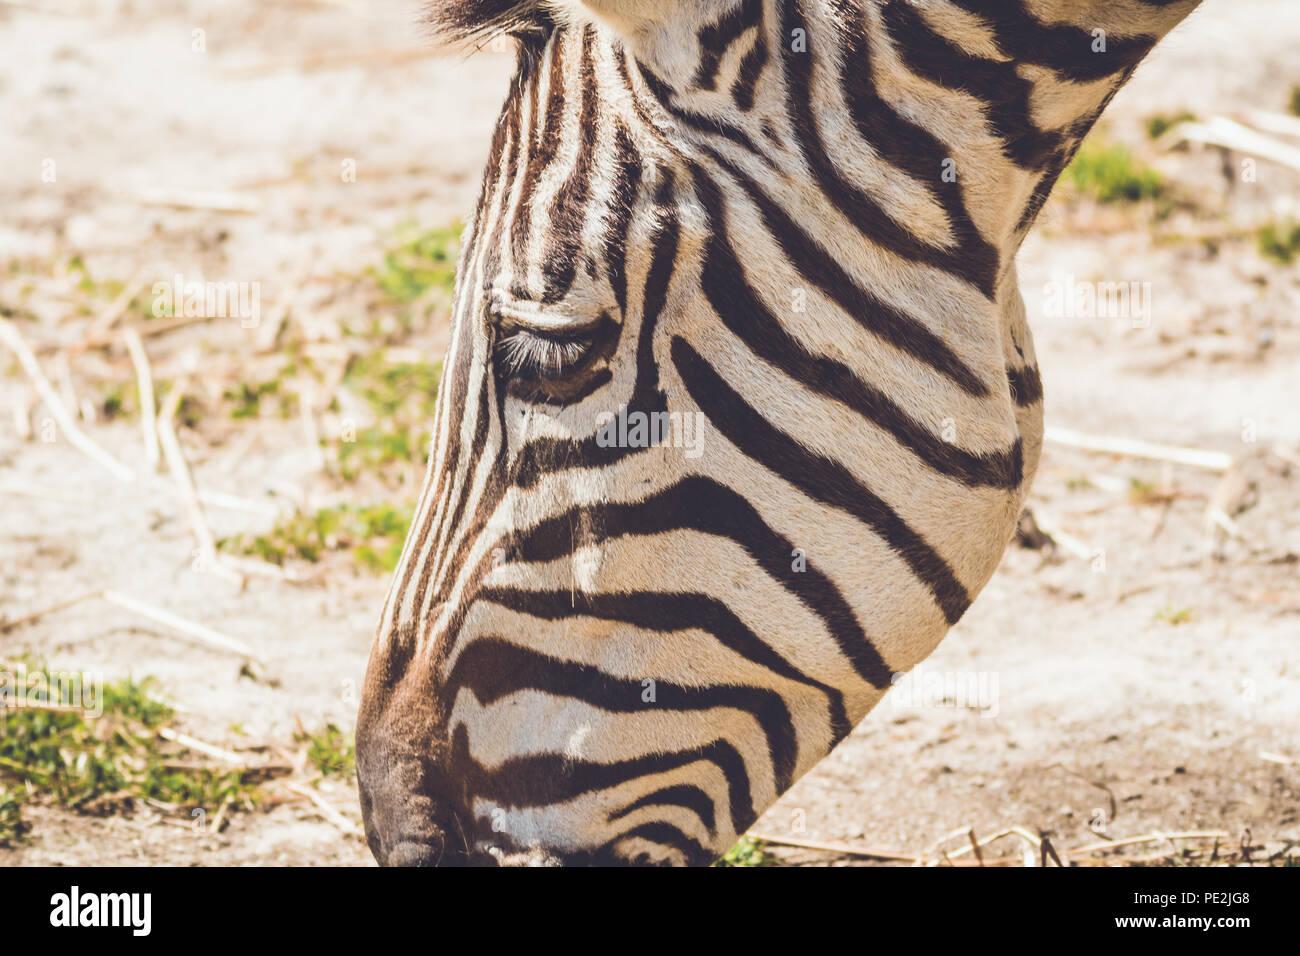 Zebra (Equus quagga) grazes on wild grass in sandy soil in a vintage garden setting - Stock Image